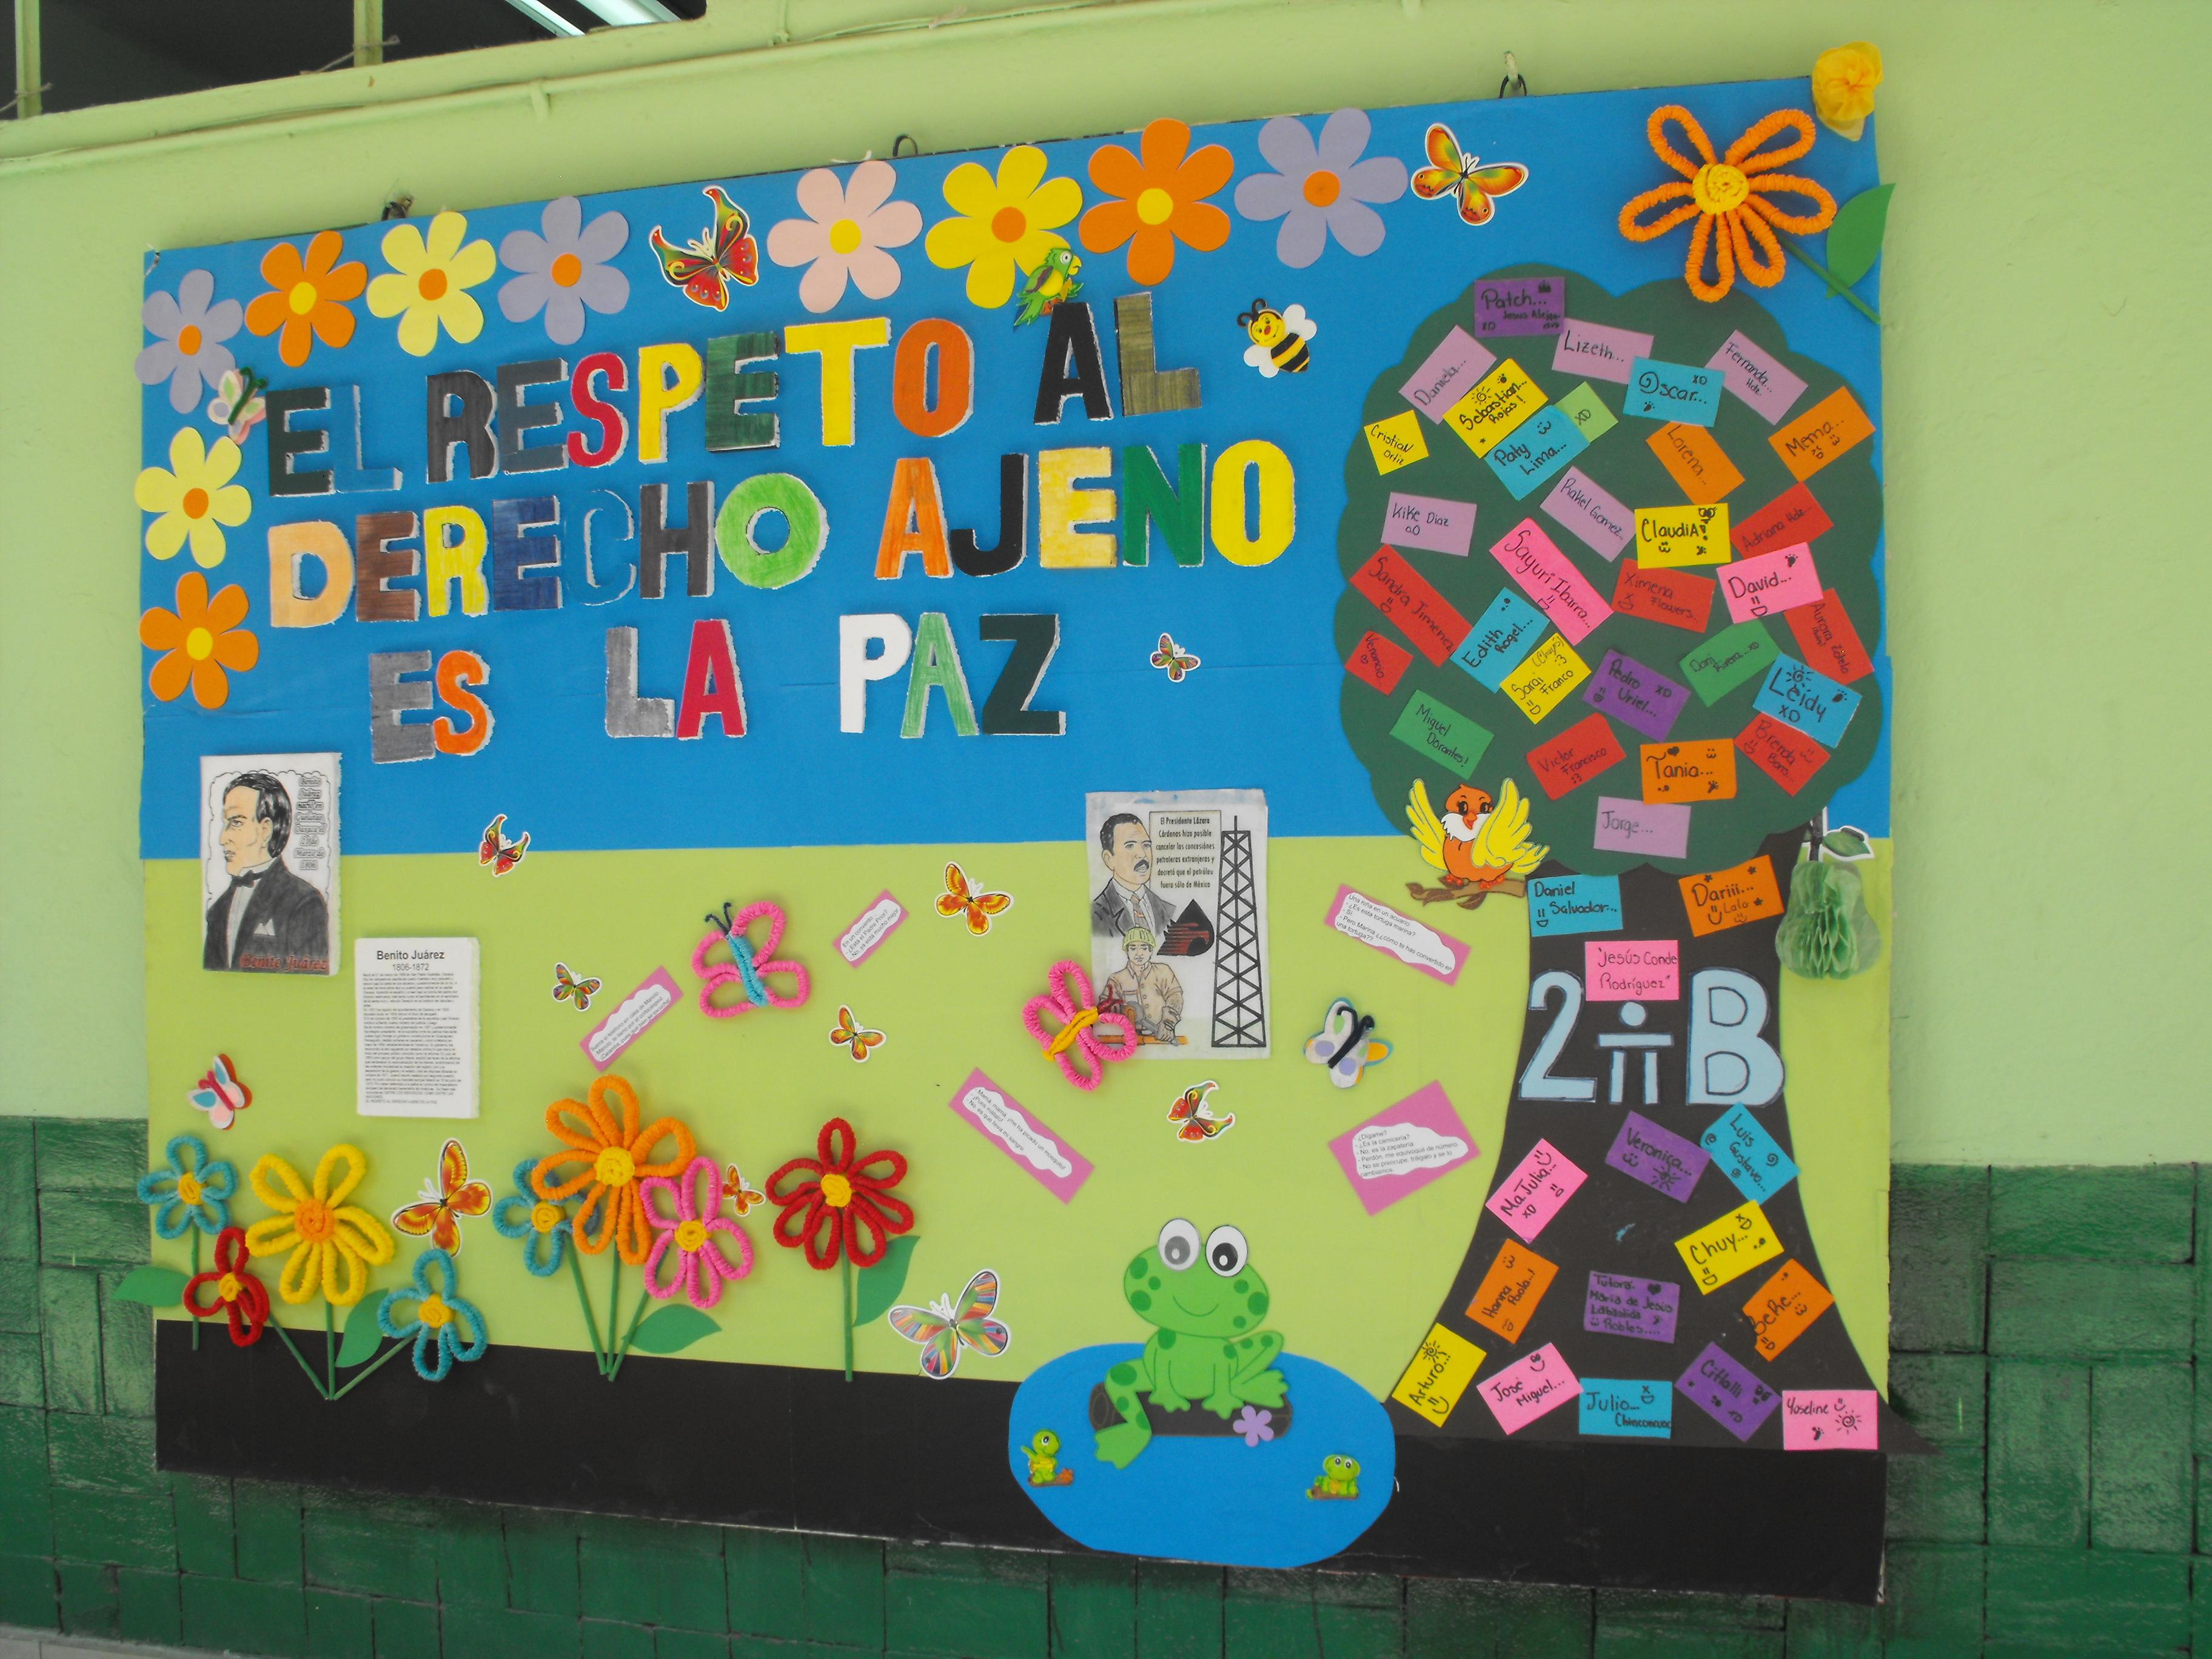 Periodico mural 2 imagenes educativas for Como elaborar un periodico mural escolar